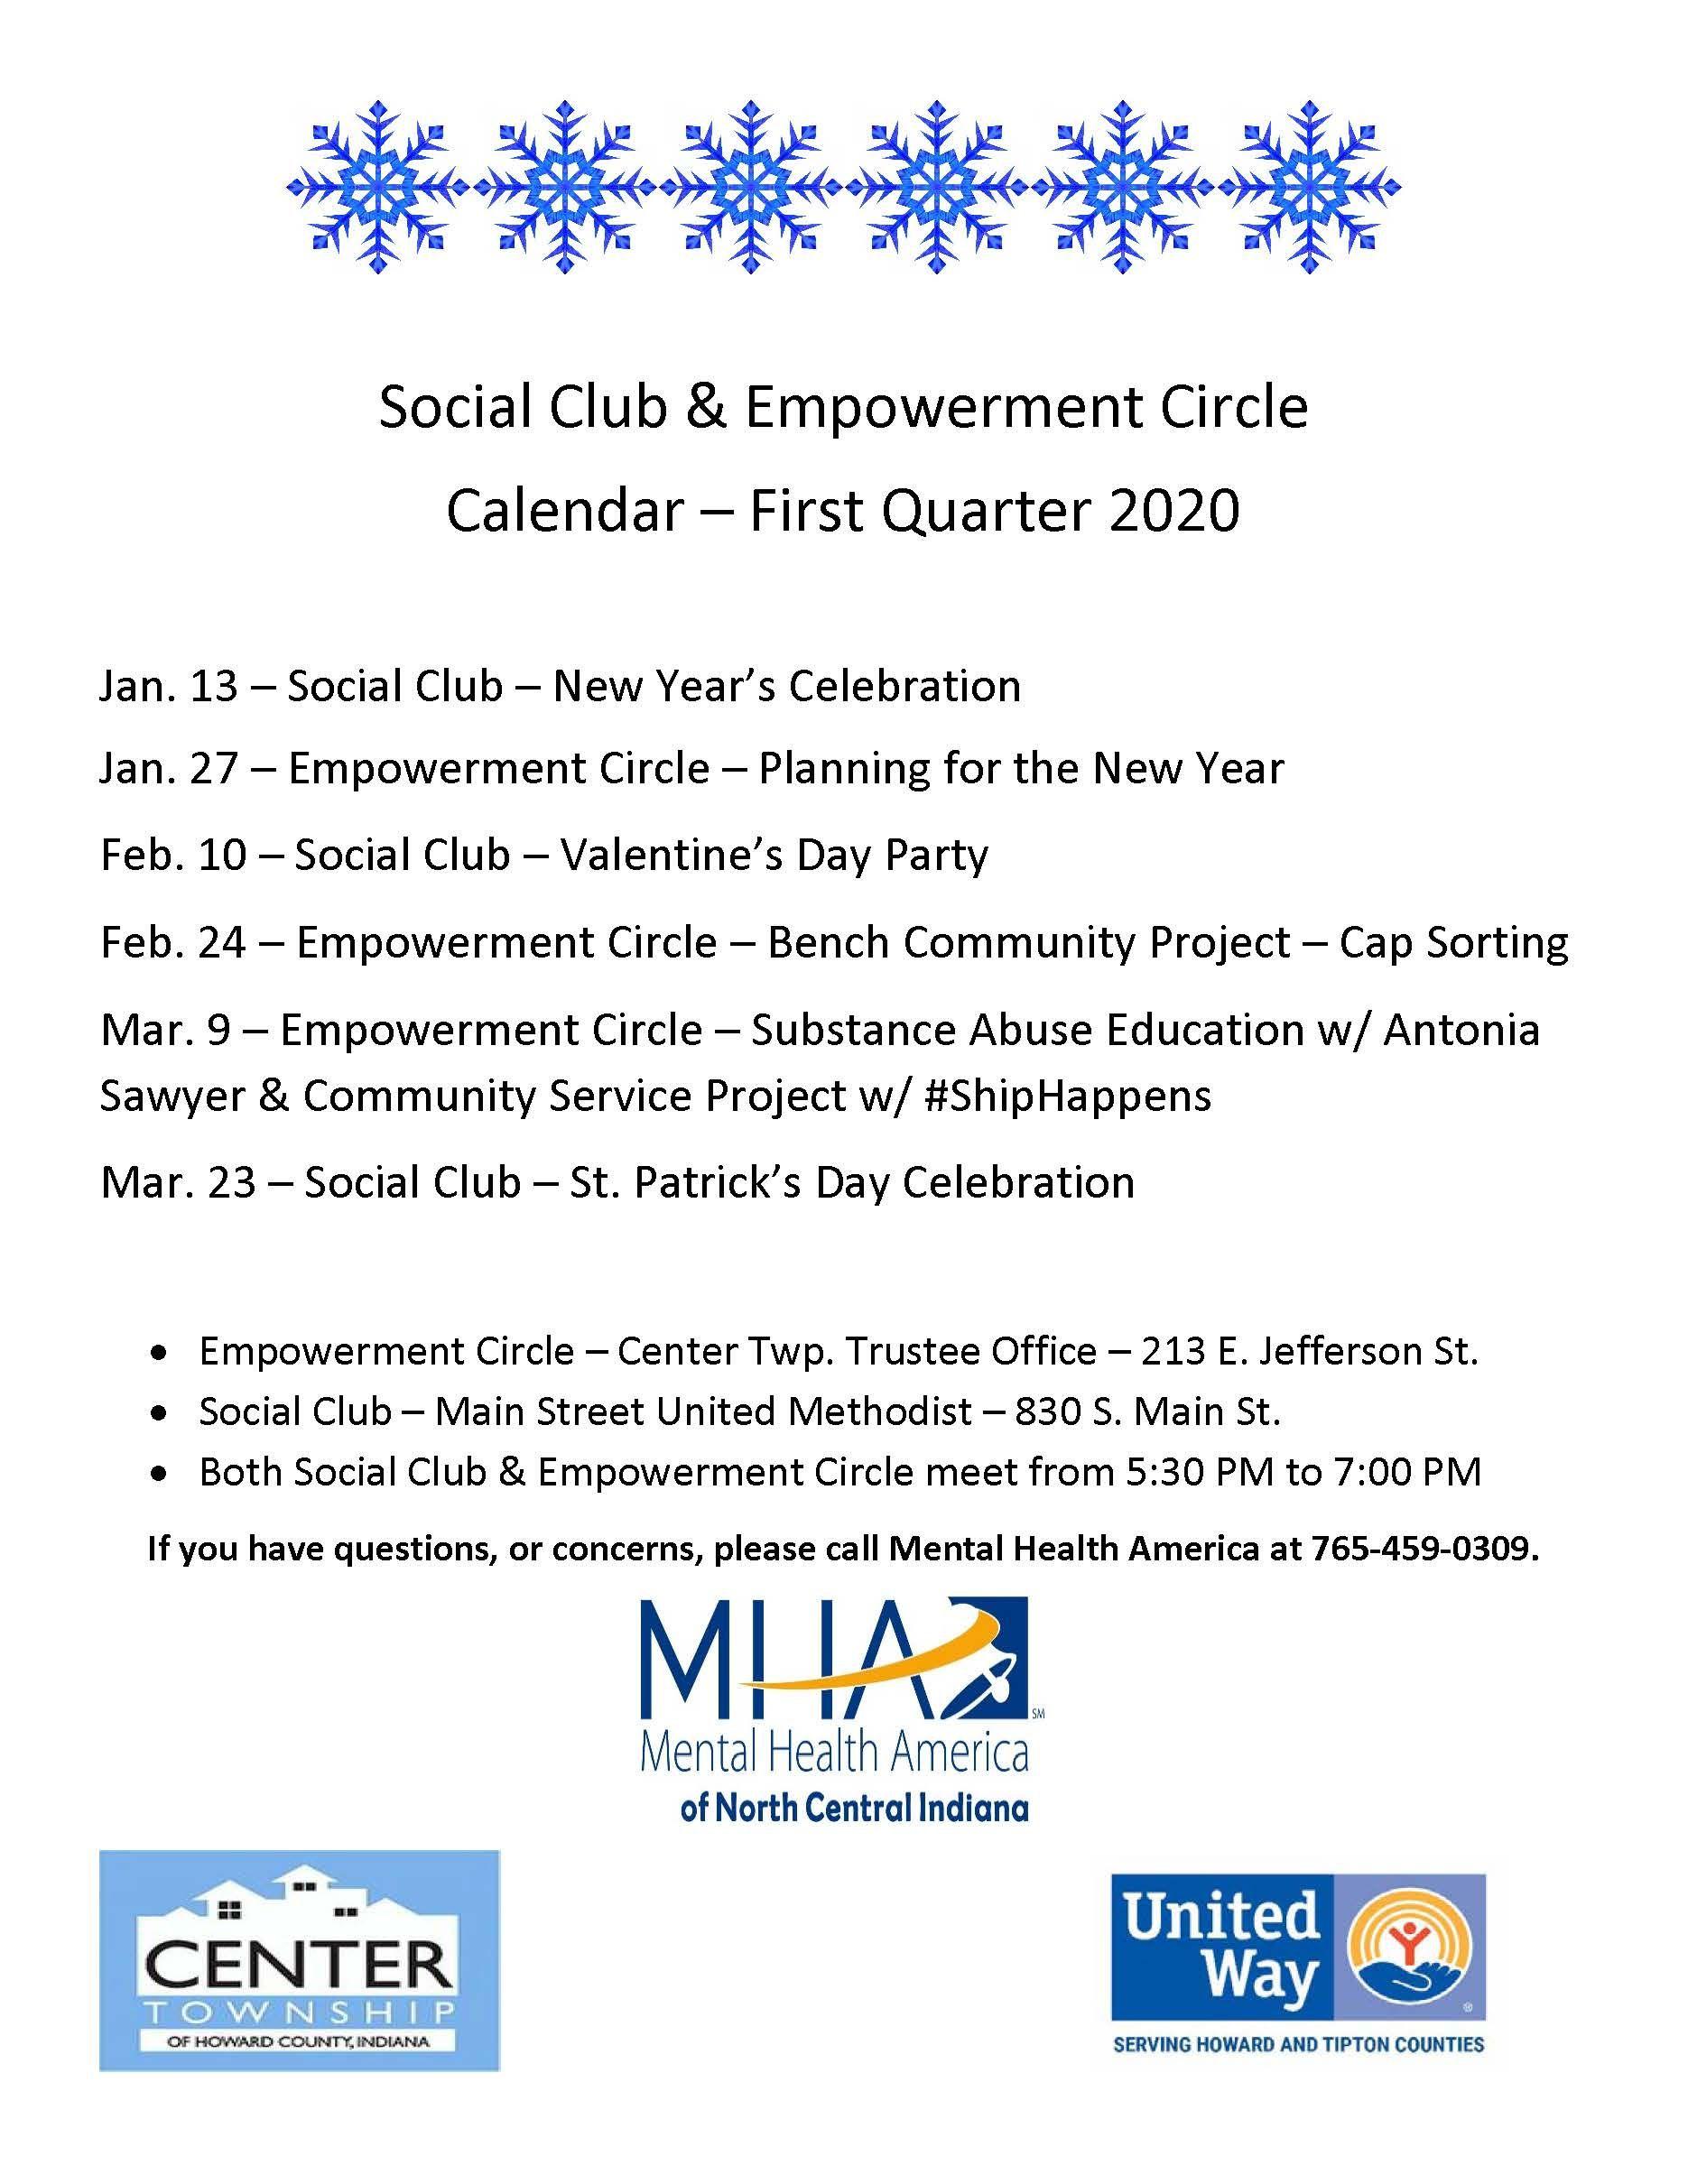 Empowerment Circle - Community Project